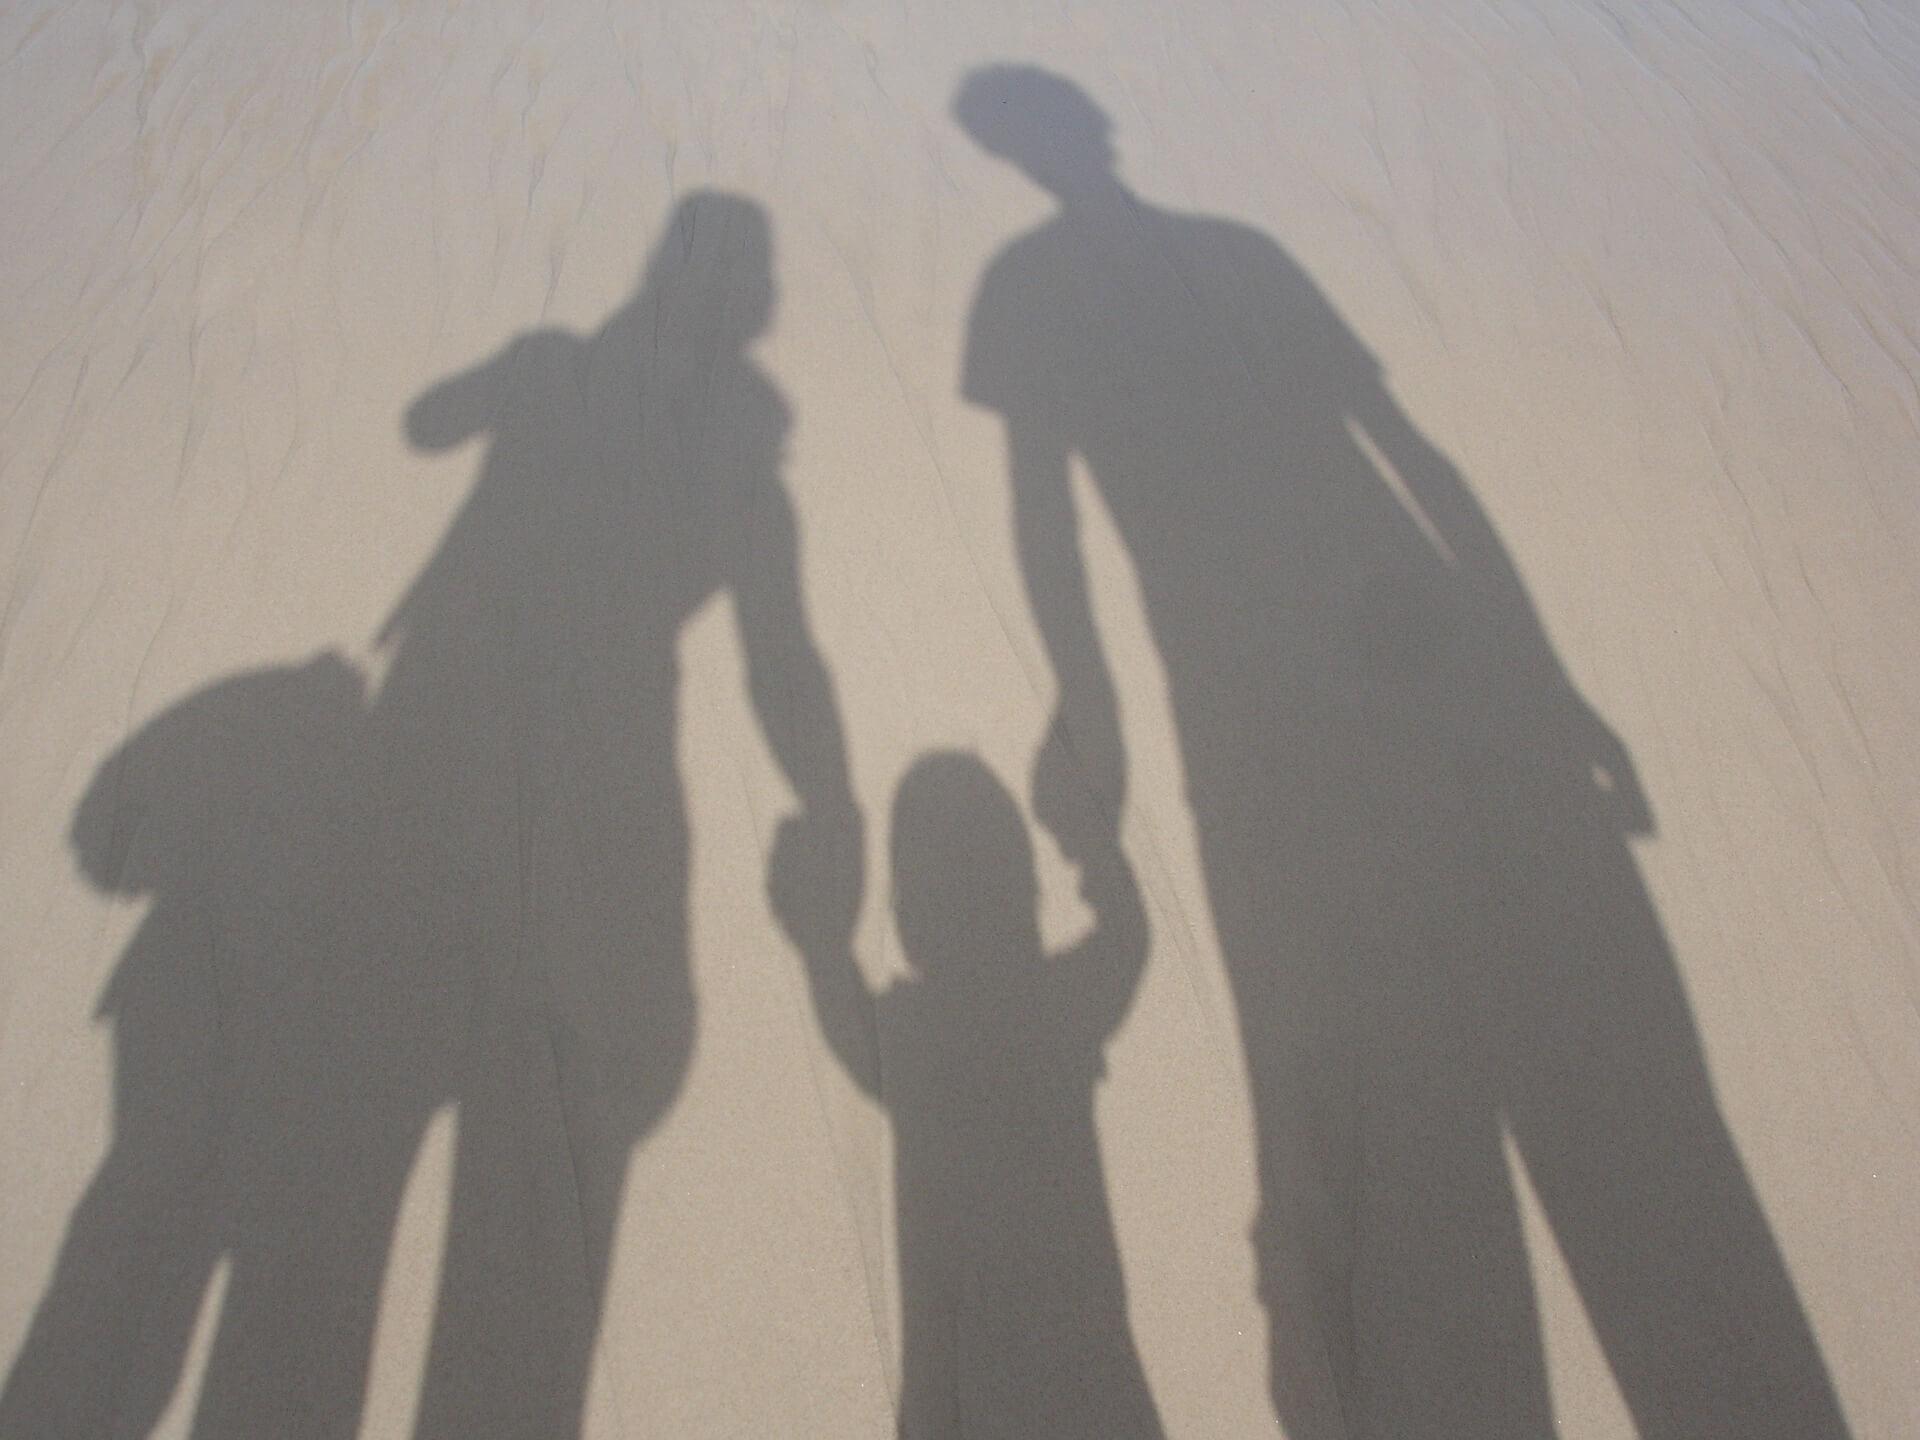 Familien i ferien